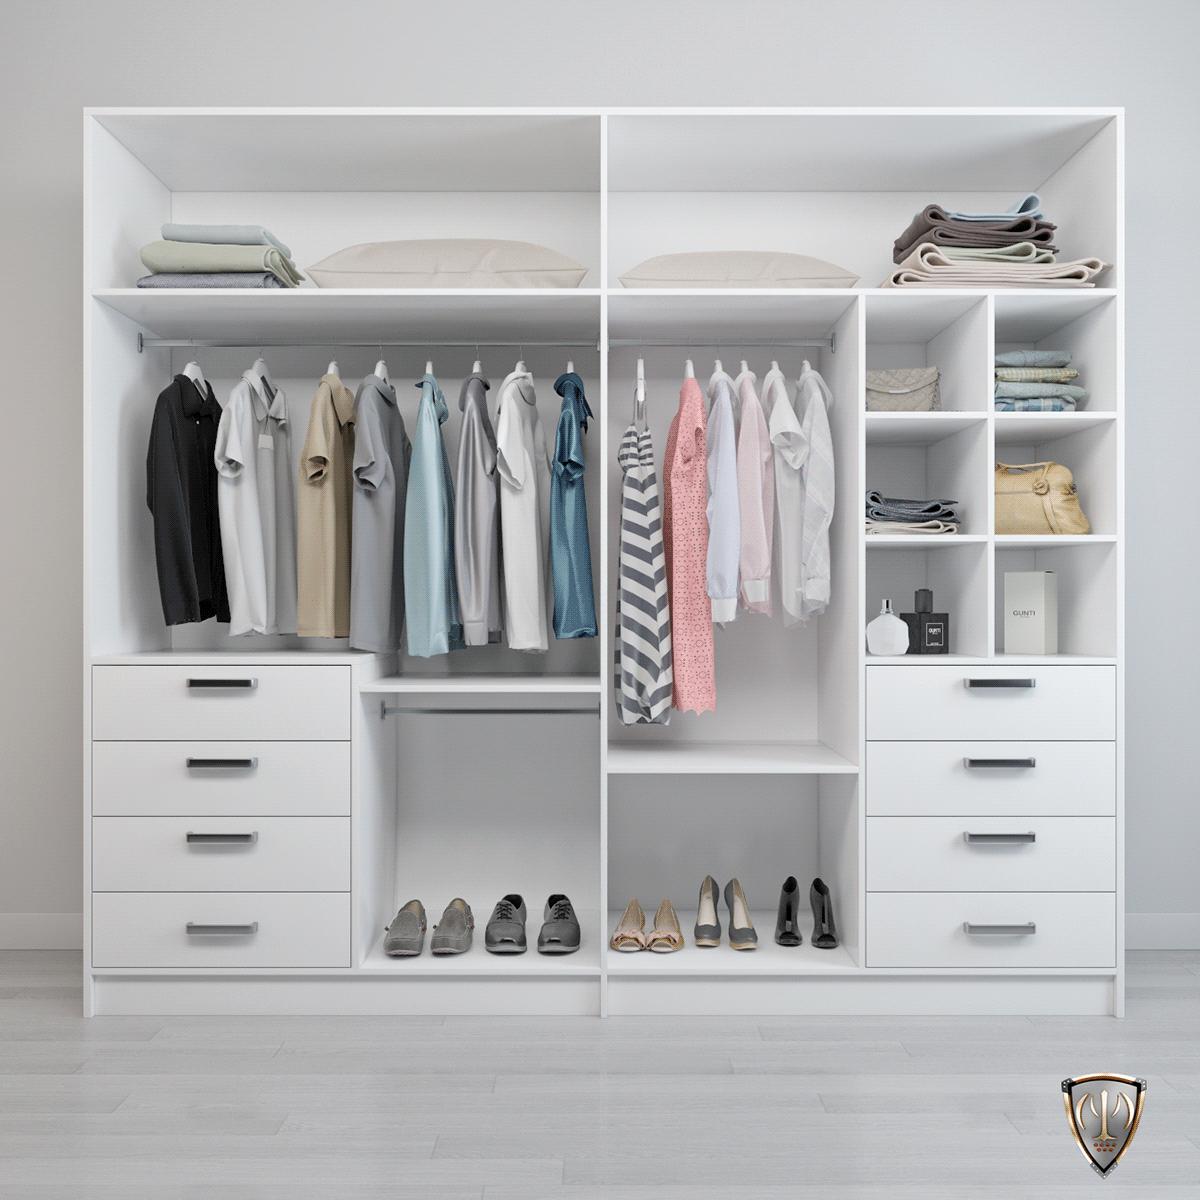 Image may contain: indoor, wall and closet